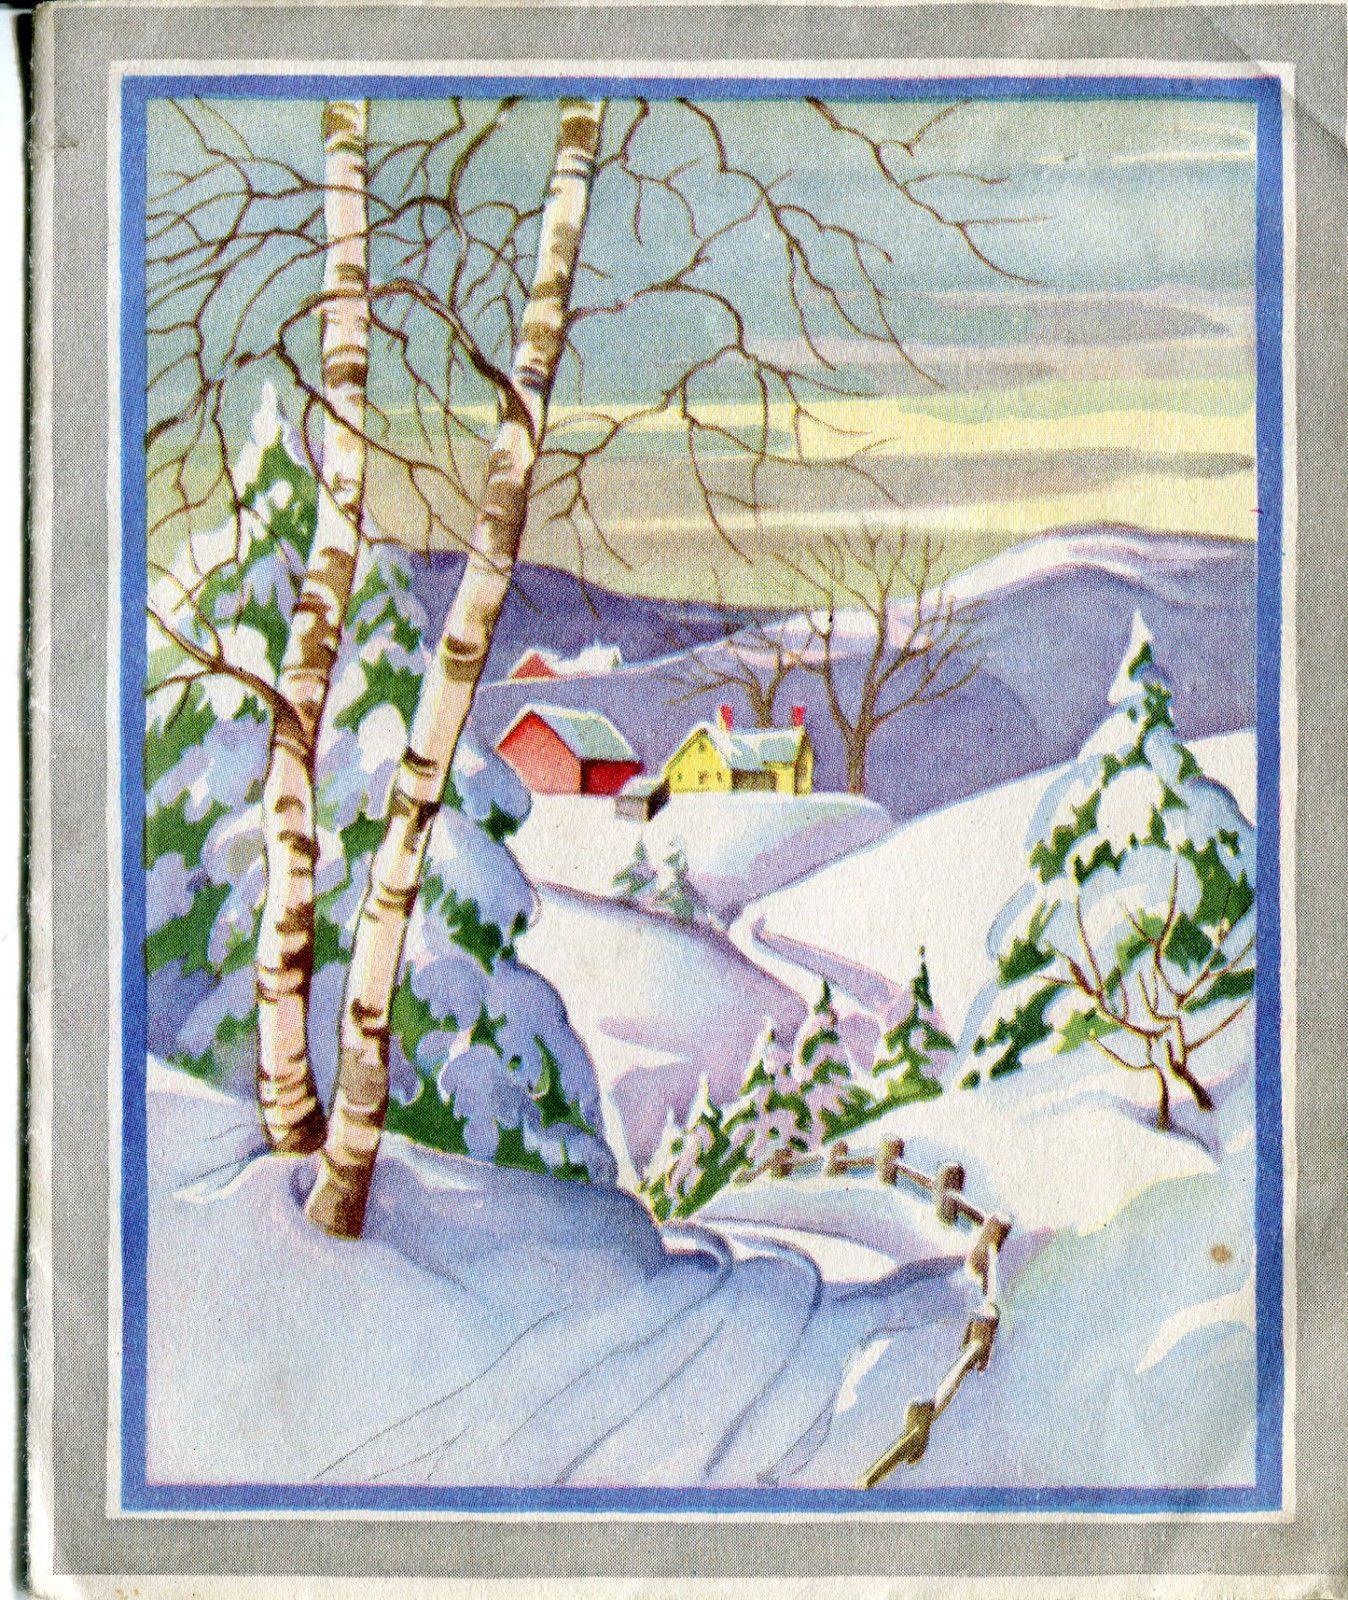 Vintage Whitman Christmas Card Farm in The Snow | eBay